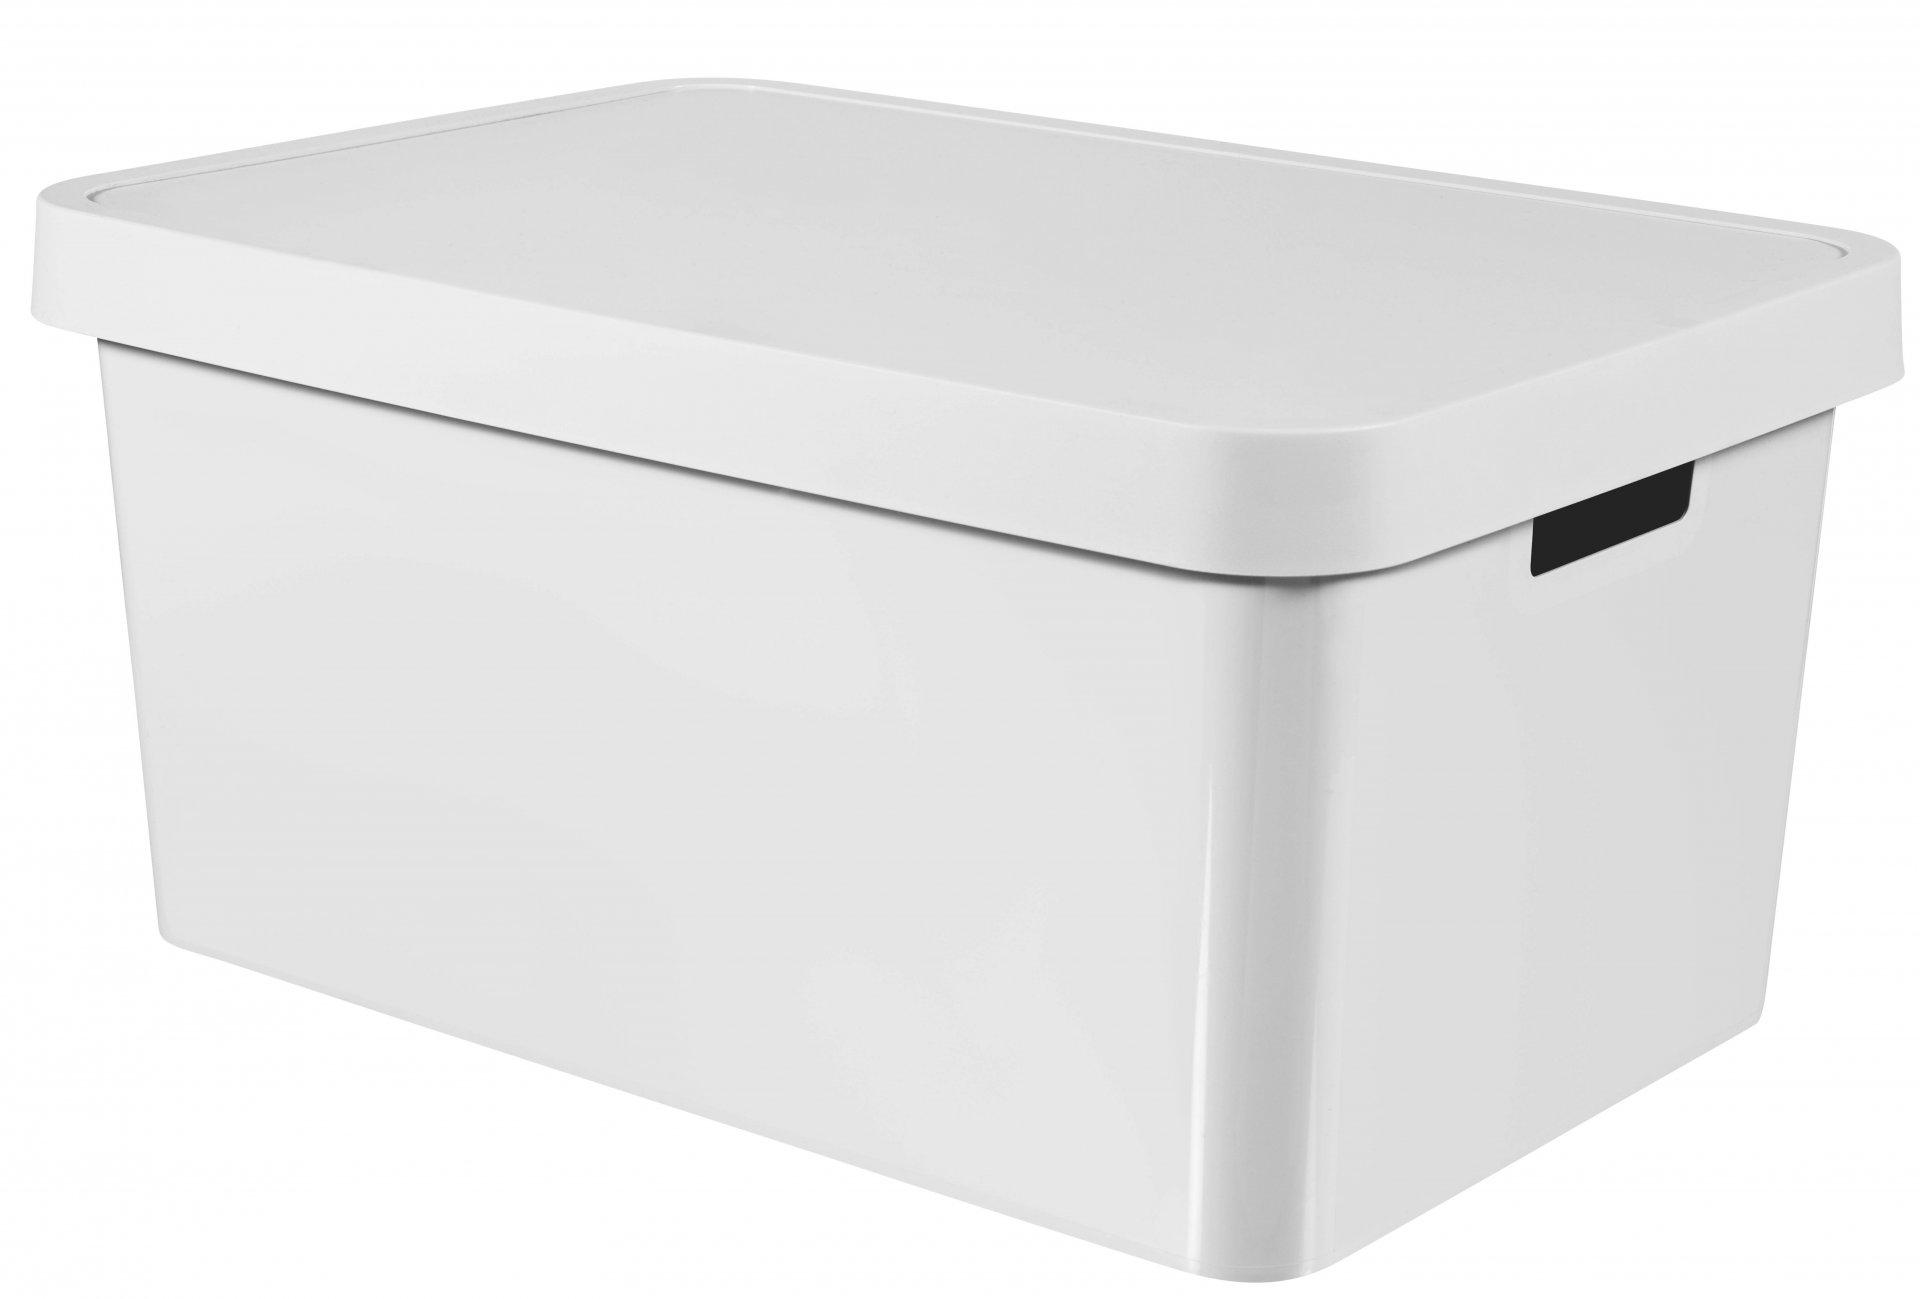 Curver box, INFINITY, bílý, 45l